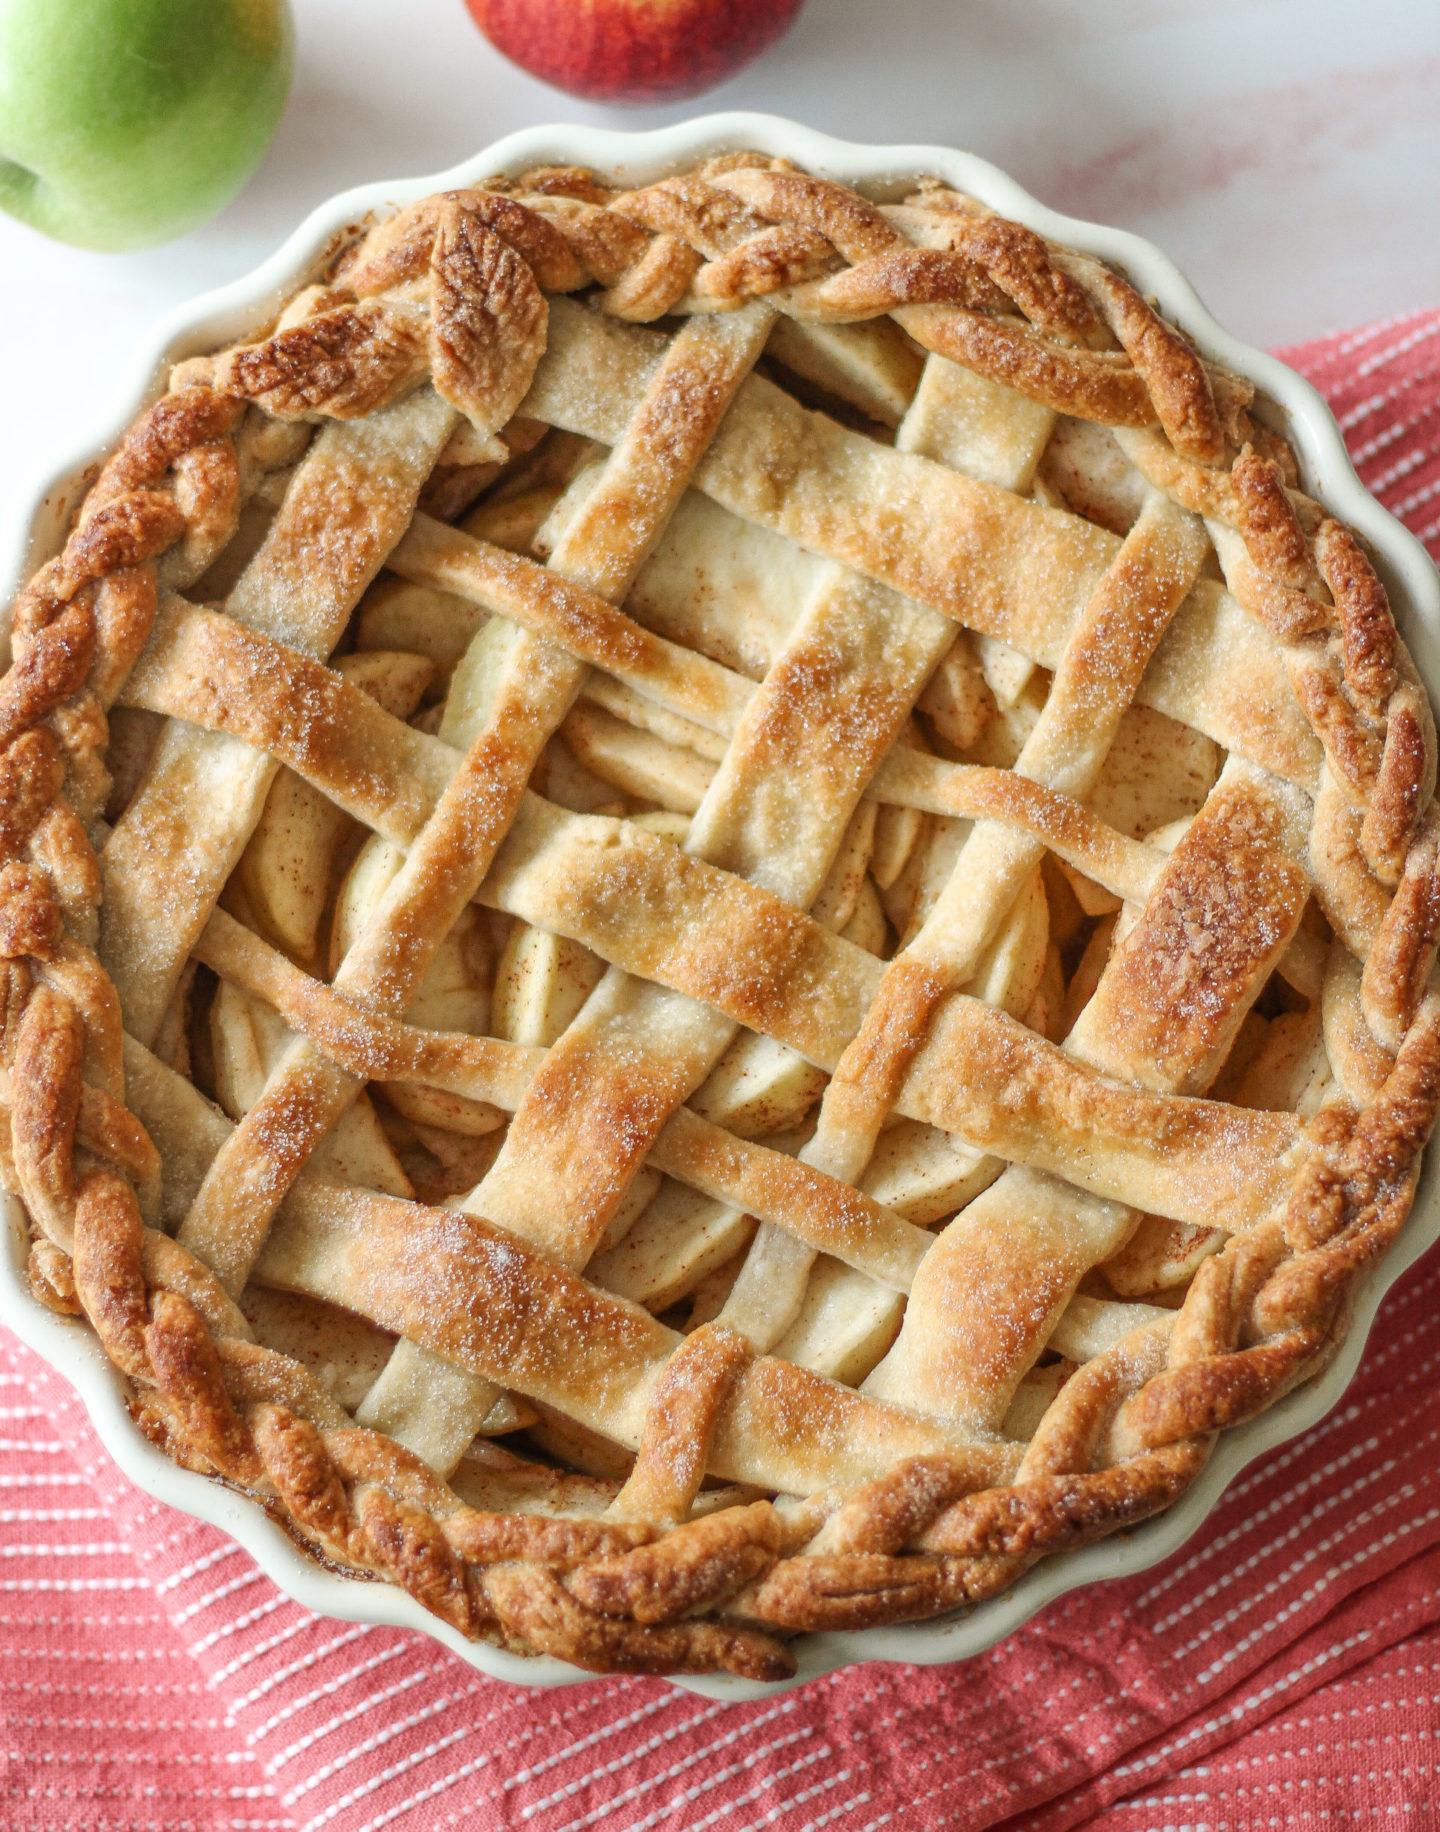 overhead view of whole uncut lattice apple pie